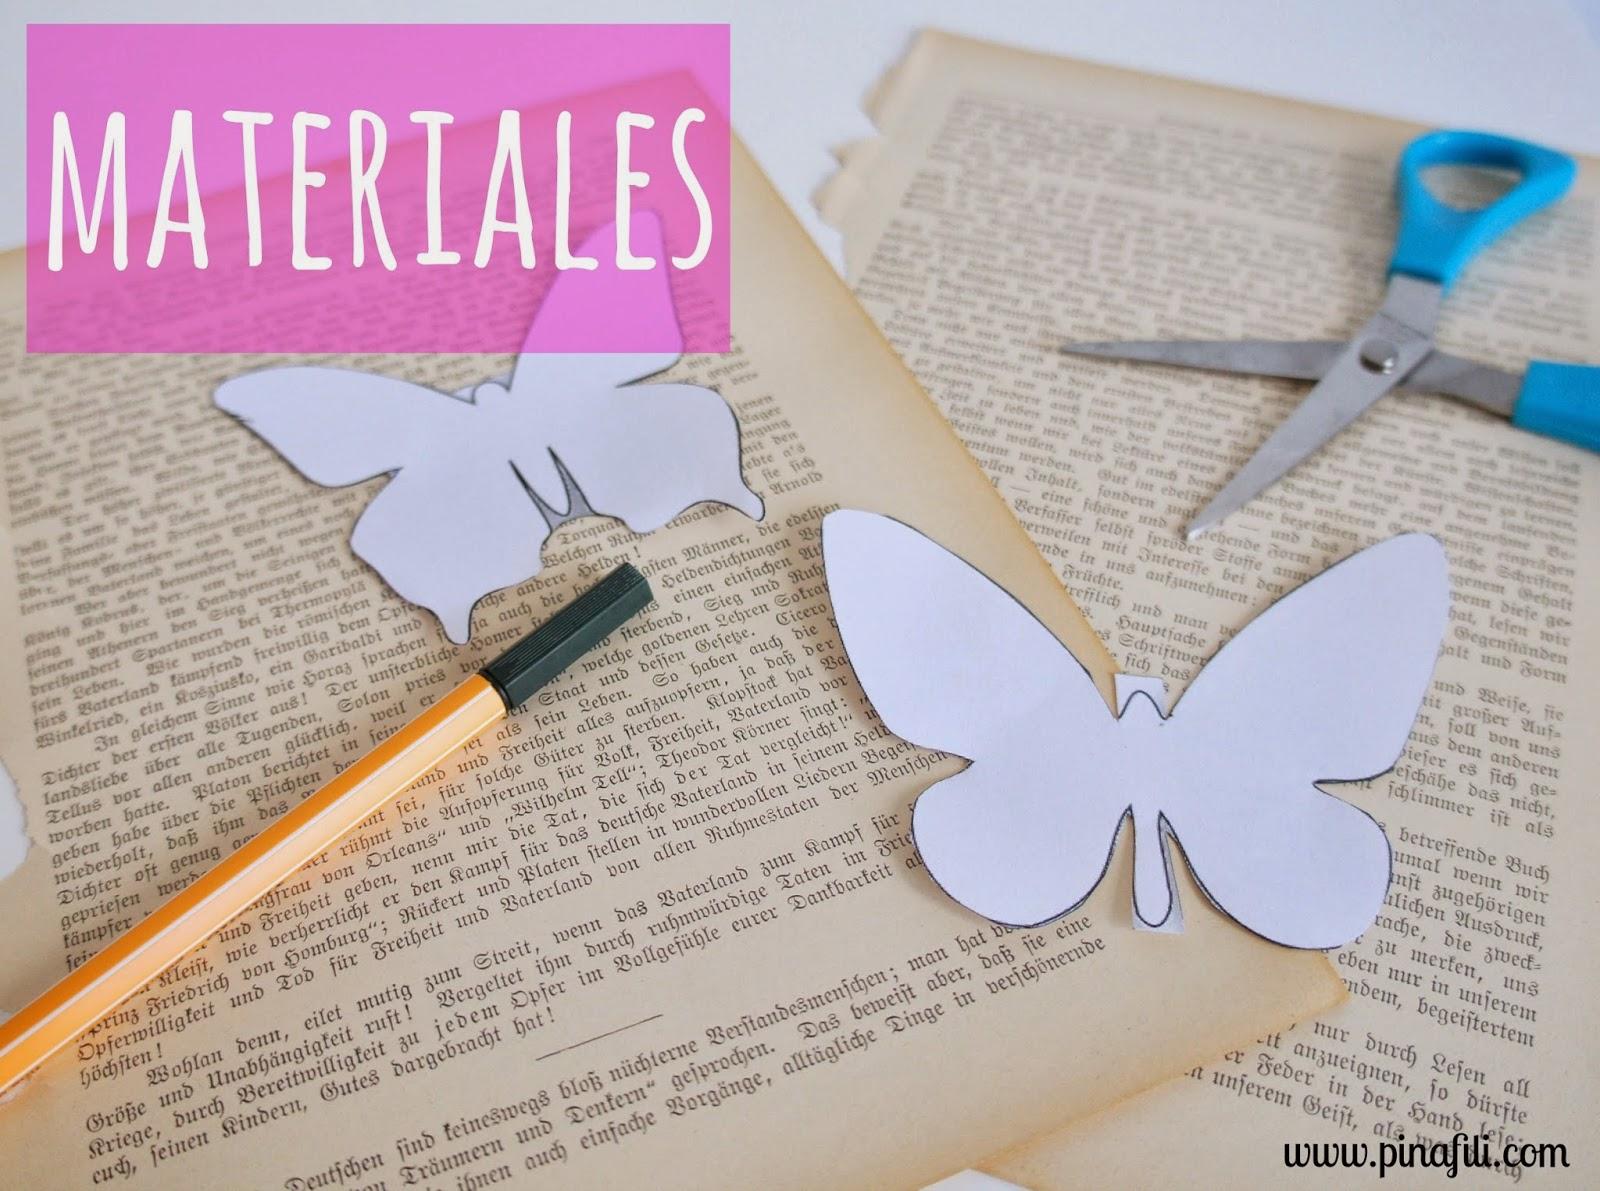 Pinafili diy mariposas de papel para decorar - Como hacer mariposas de papel para decorar paredes ...